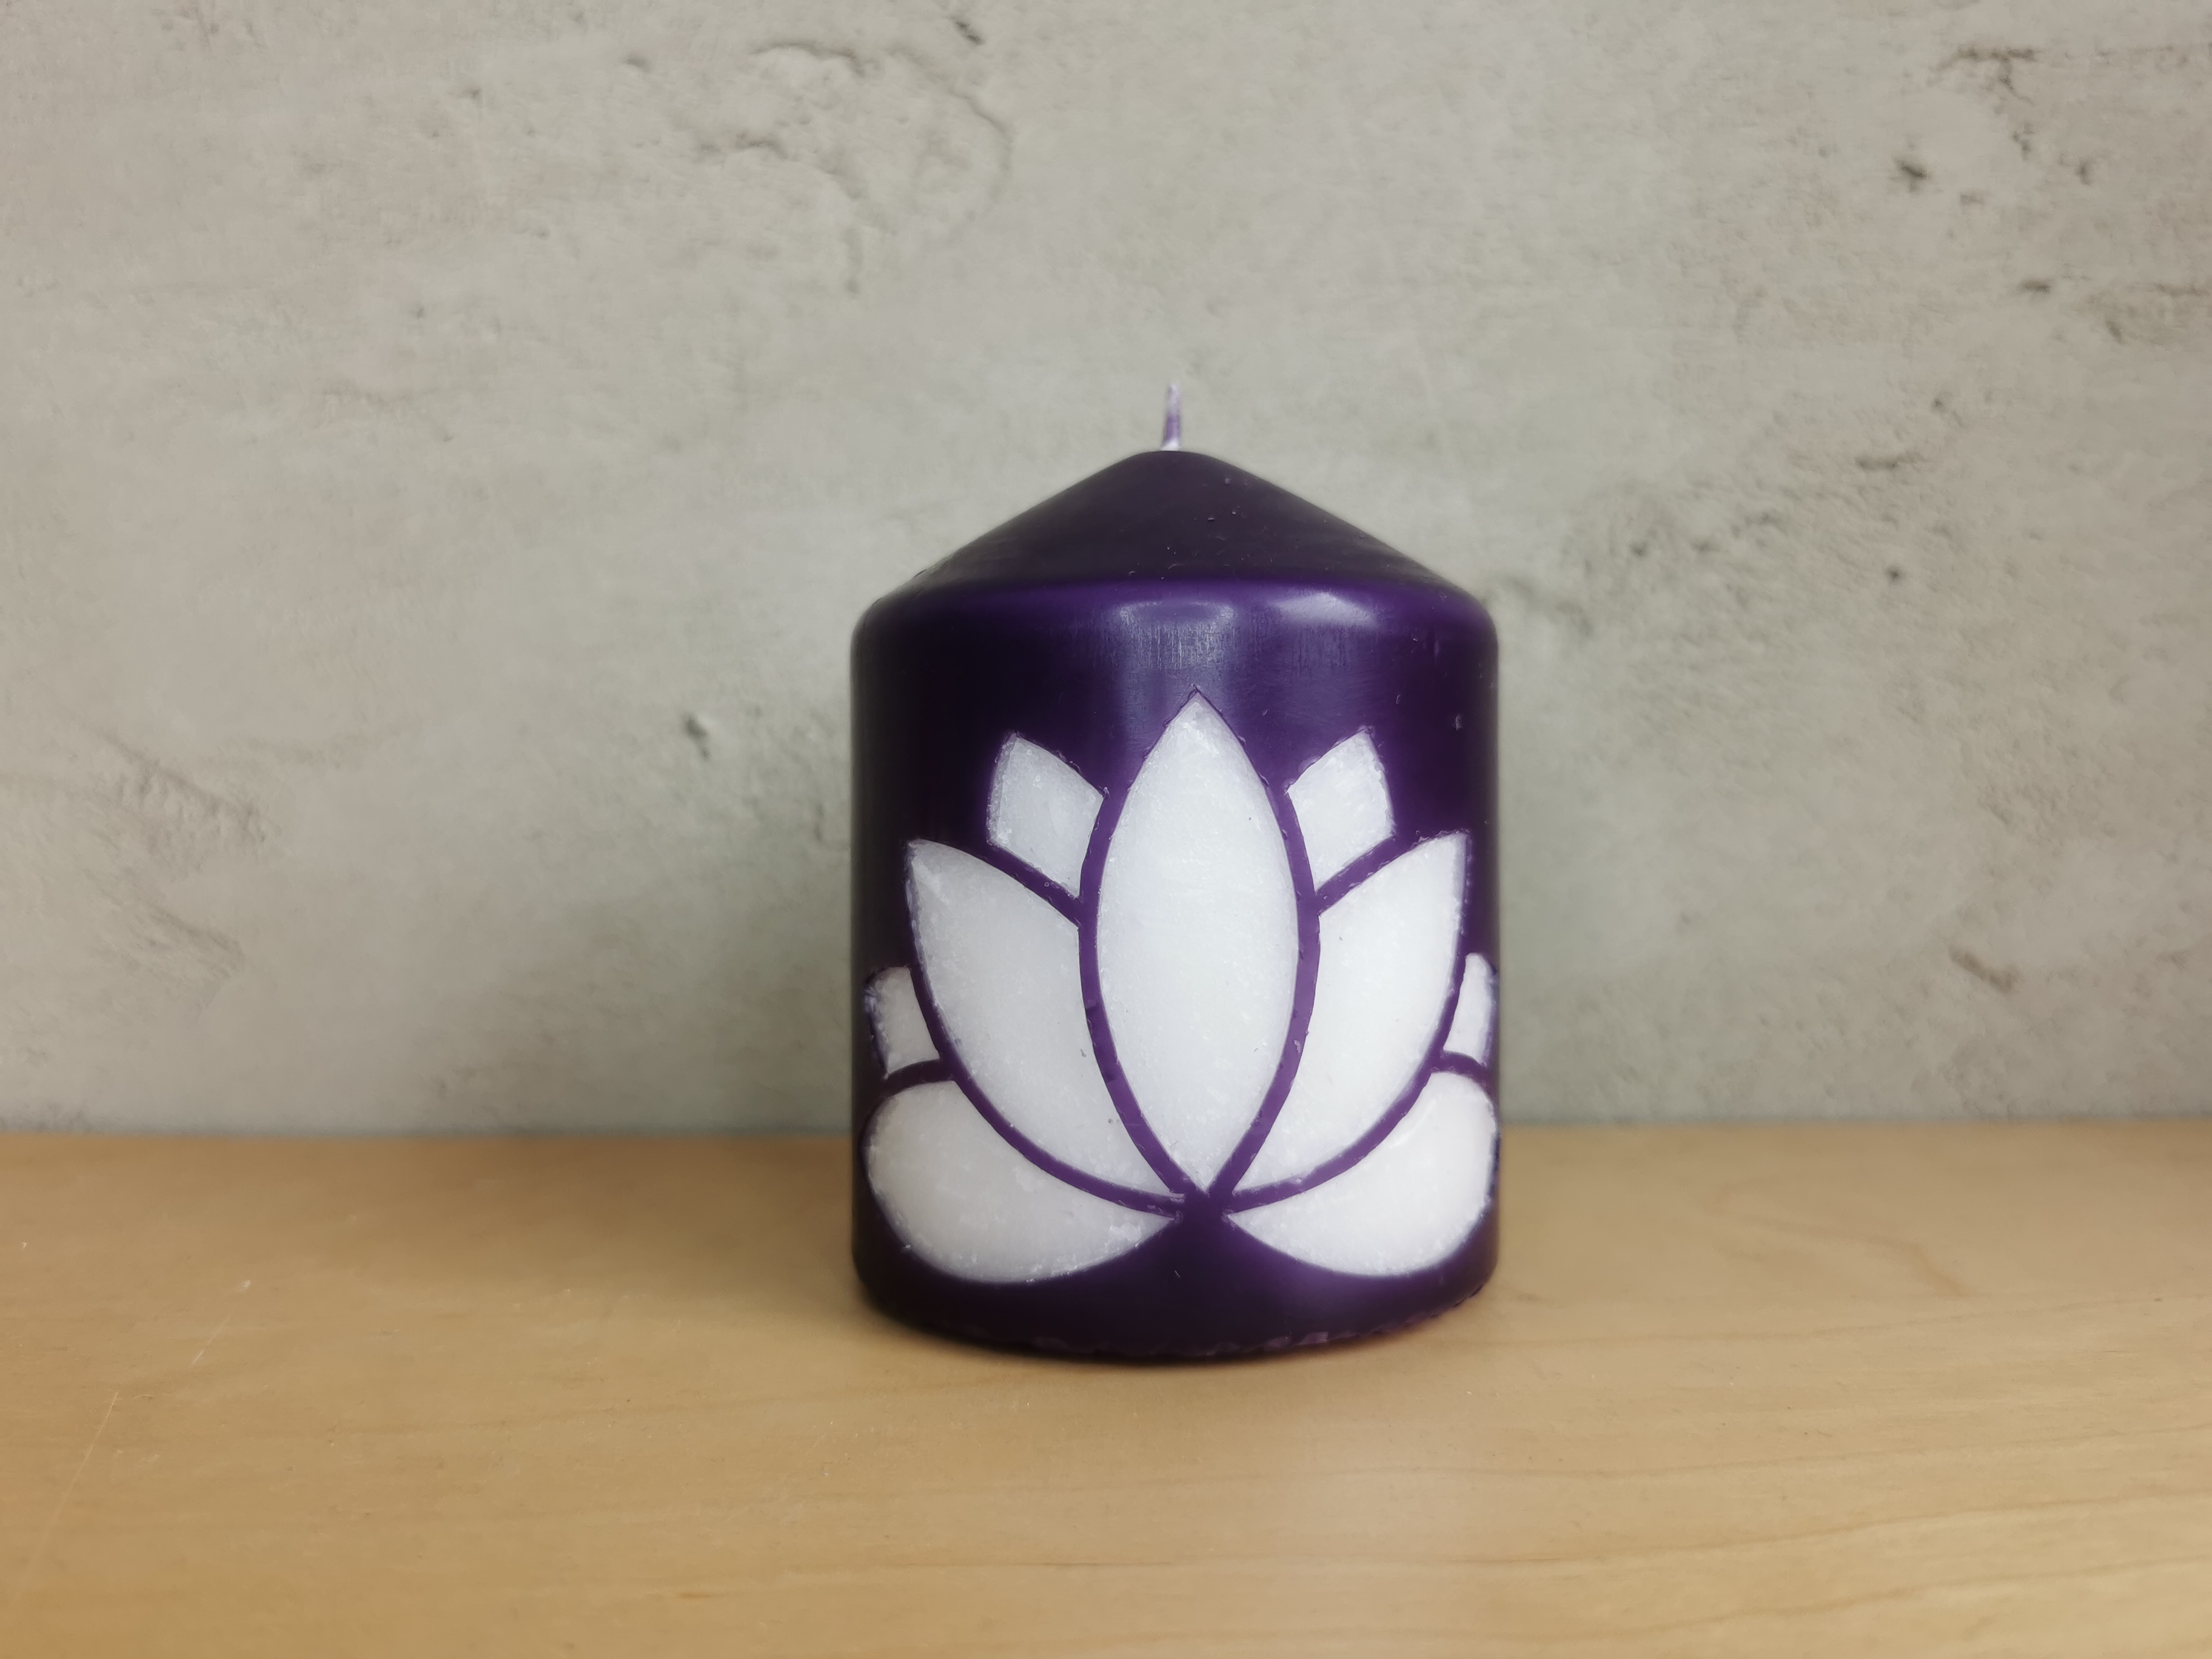 Ritual und Meditations- Kerze - das Feuer entzünden